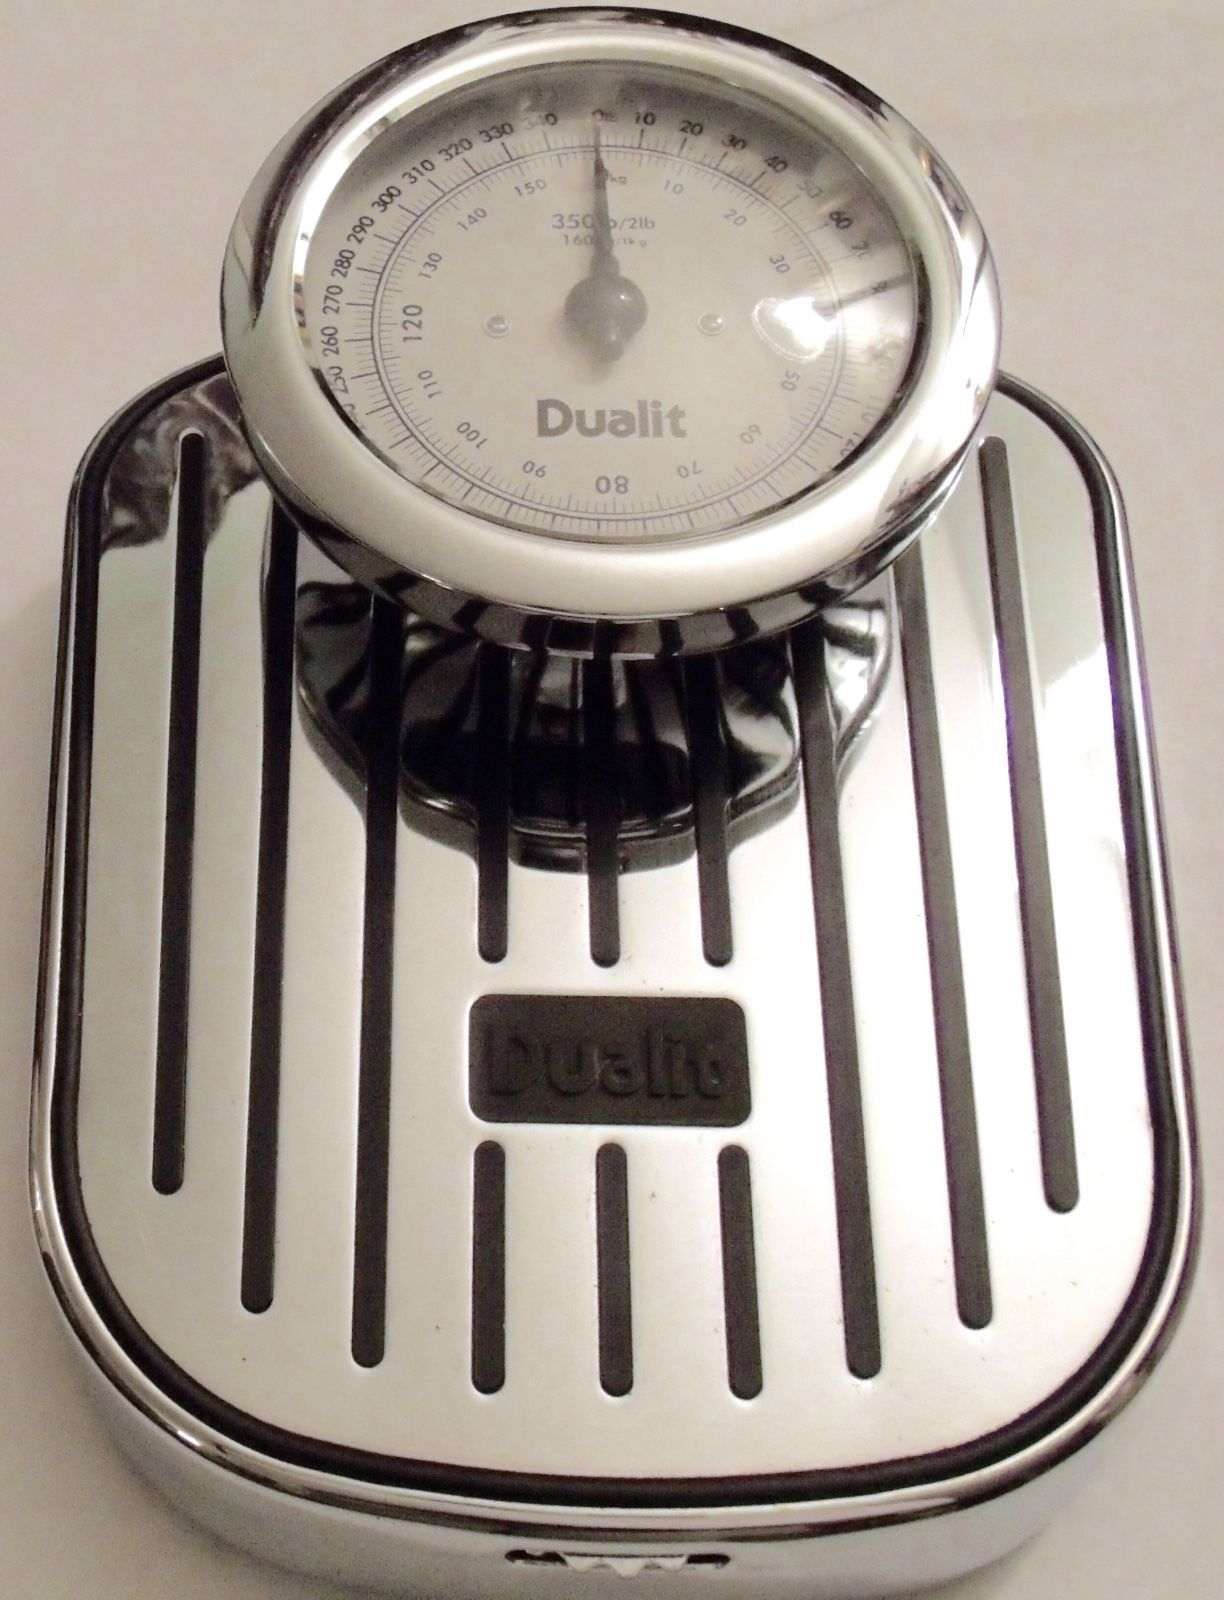 Dualit Bathroom Scale Chrome Black Retro 300 Lbs Body Weight Management Dualit Bathroom Scale Weight Management